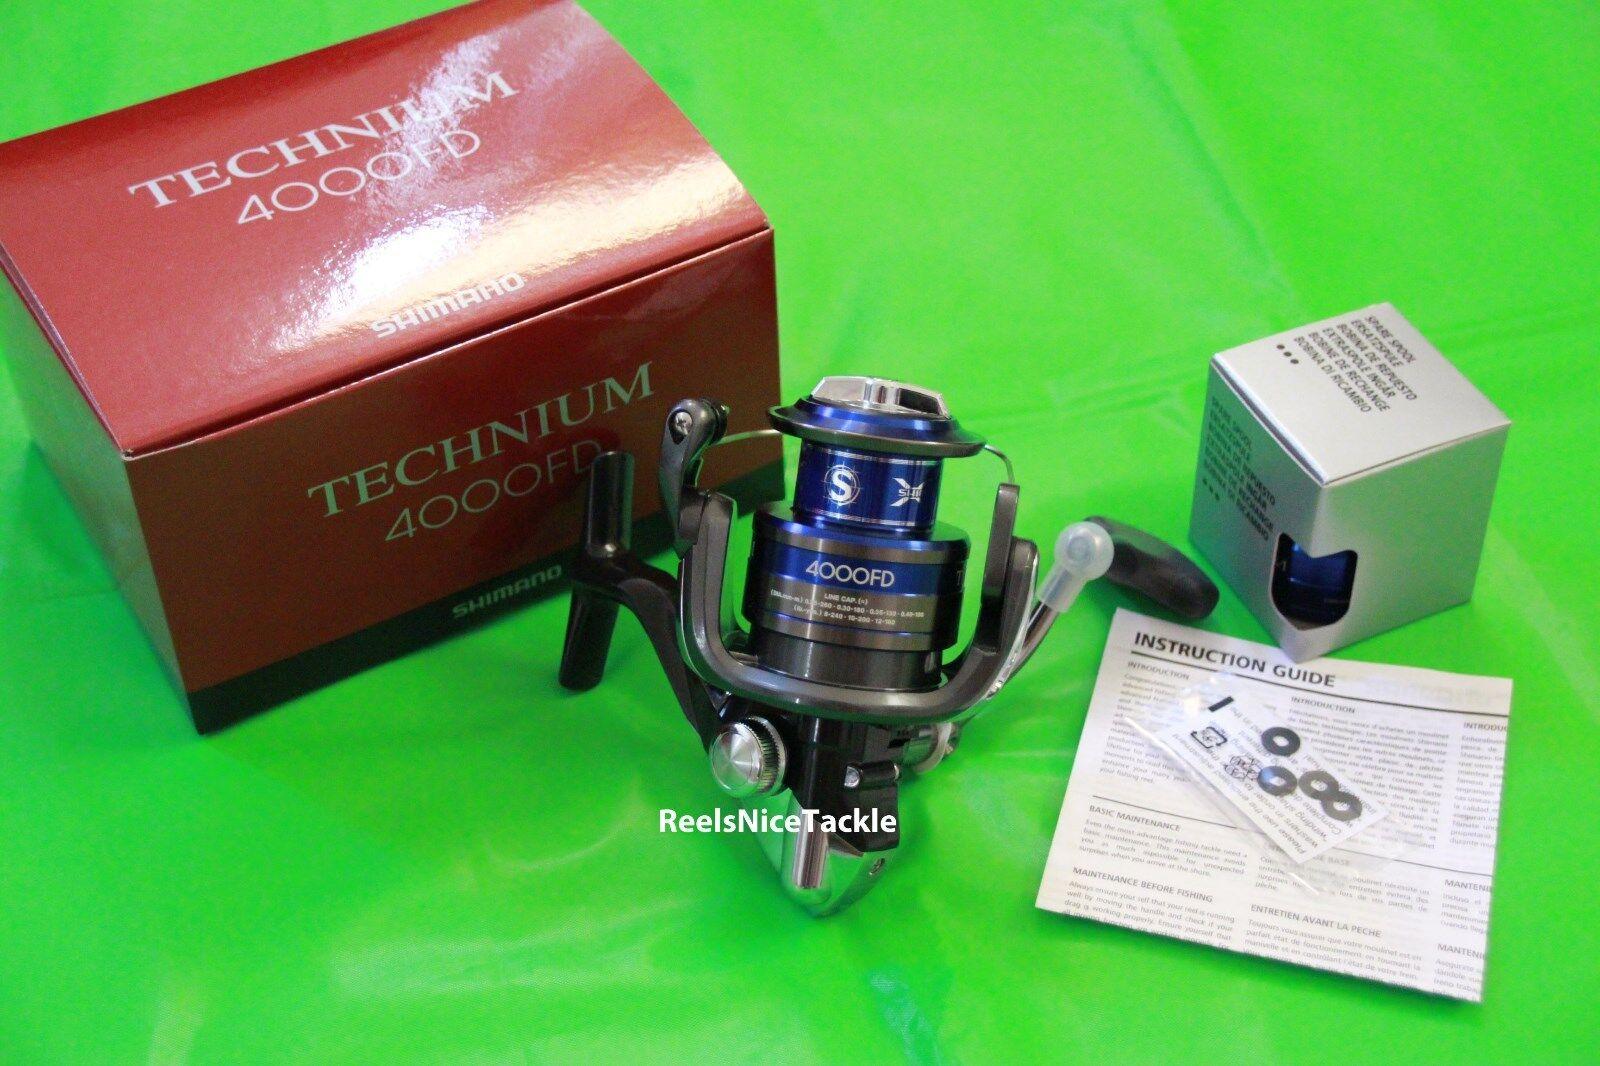 NIB Shiuomoo Technium 4000 FD Spinning Reel TEC4000FD plus spare spool gratuito 3 DAY